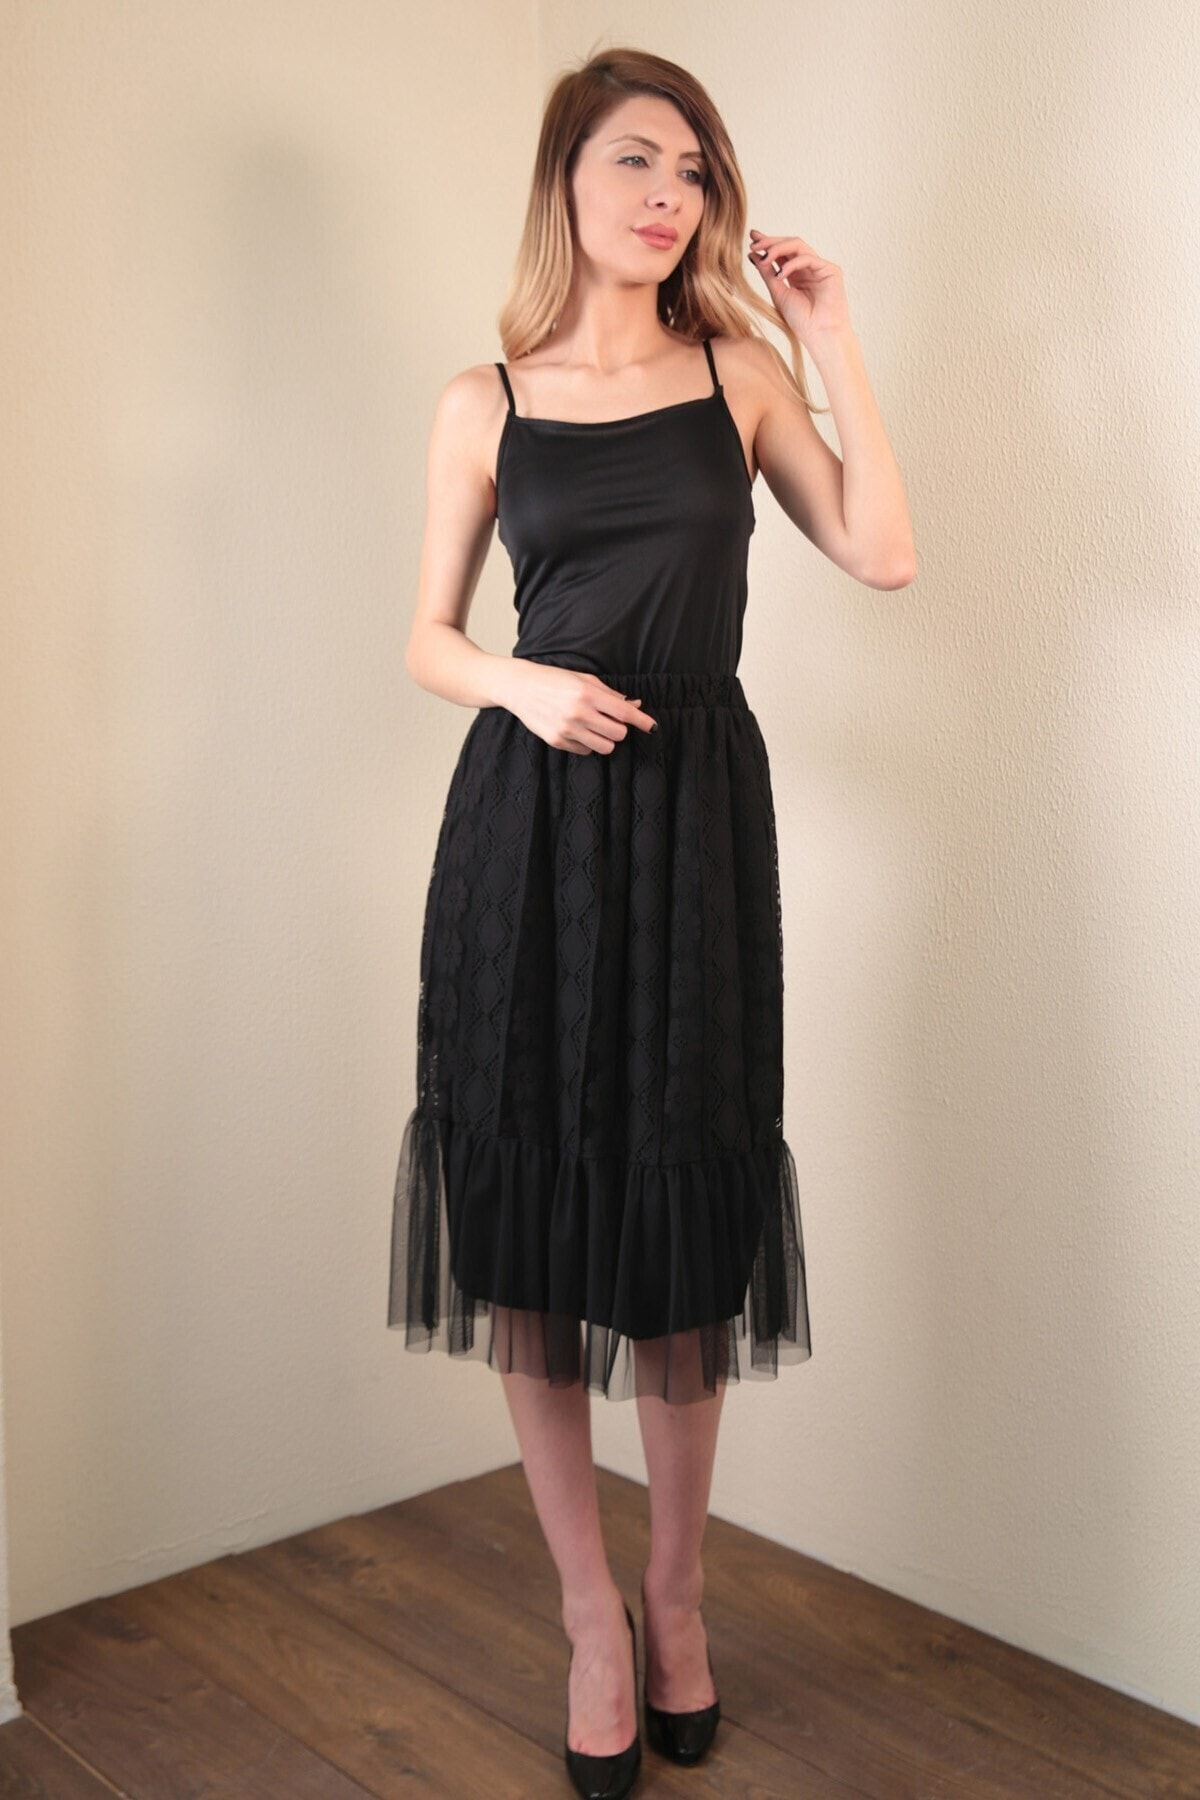 Women's Long Black Lace Pleat Skirt Women Skirt Fashion Casual Sport